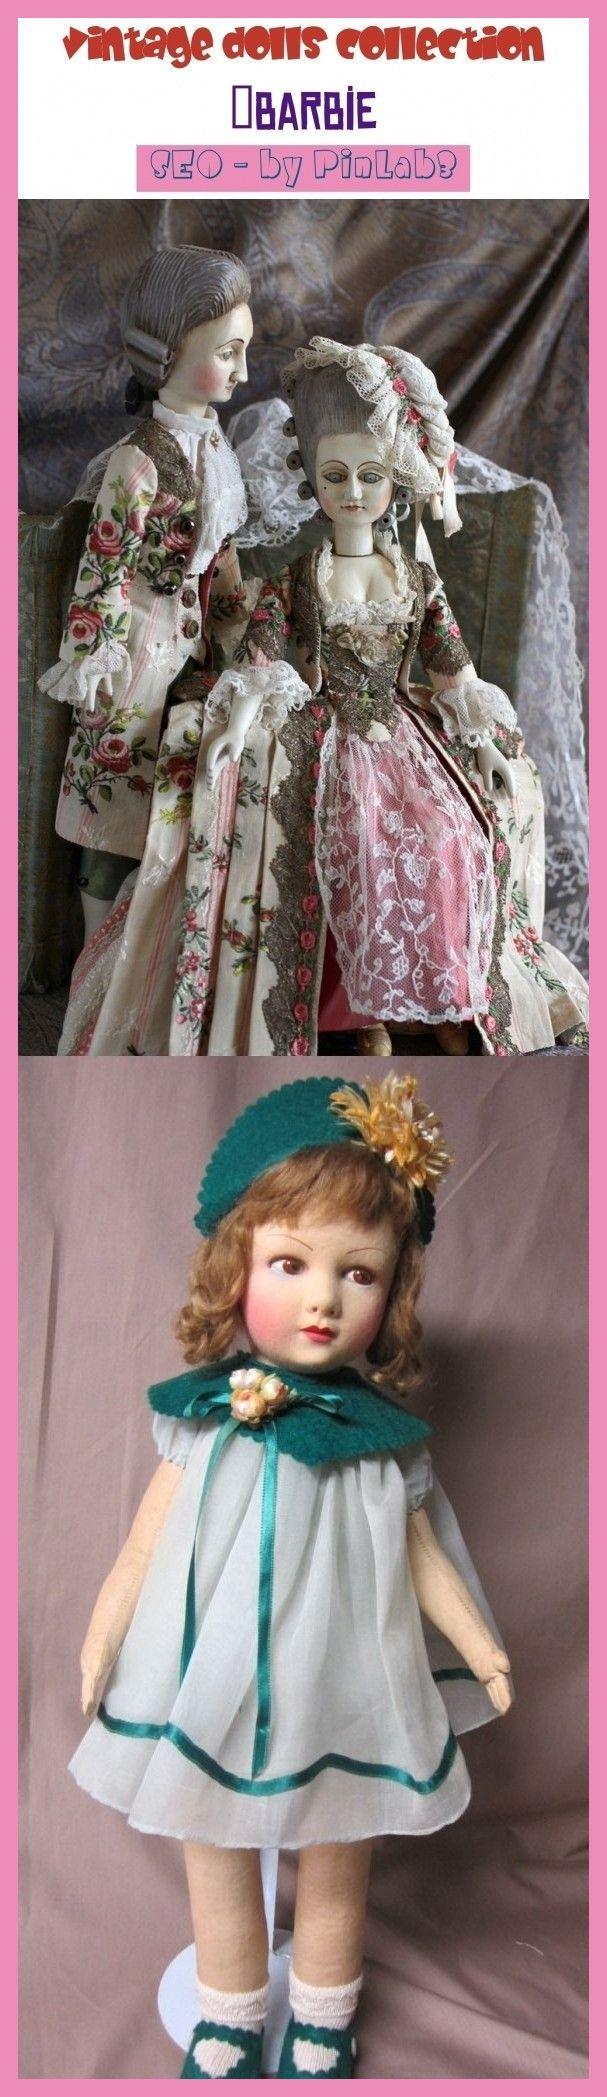 Vintage dolls collection #barbie #seotrends #trending. vintage dolls 1950s, vintage dolls 1960's, vintage dolls 1970's, vintage dolls aesthetic, vintage dolls antiques, vintage dolls 1940's, vintage dolls victorian, vintage dolls porcelain, vintage dolls 1980s, vintage dolls for sale, vintage dolls handmade, vintage dolls madame alexander, vintage dolls 1900, vintage dolls illustration, vintage dolls 1800, vintage dolls collection, vintage dolls german, vintage d. #dollvictoriandressstyles